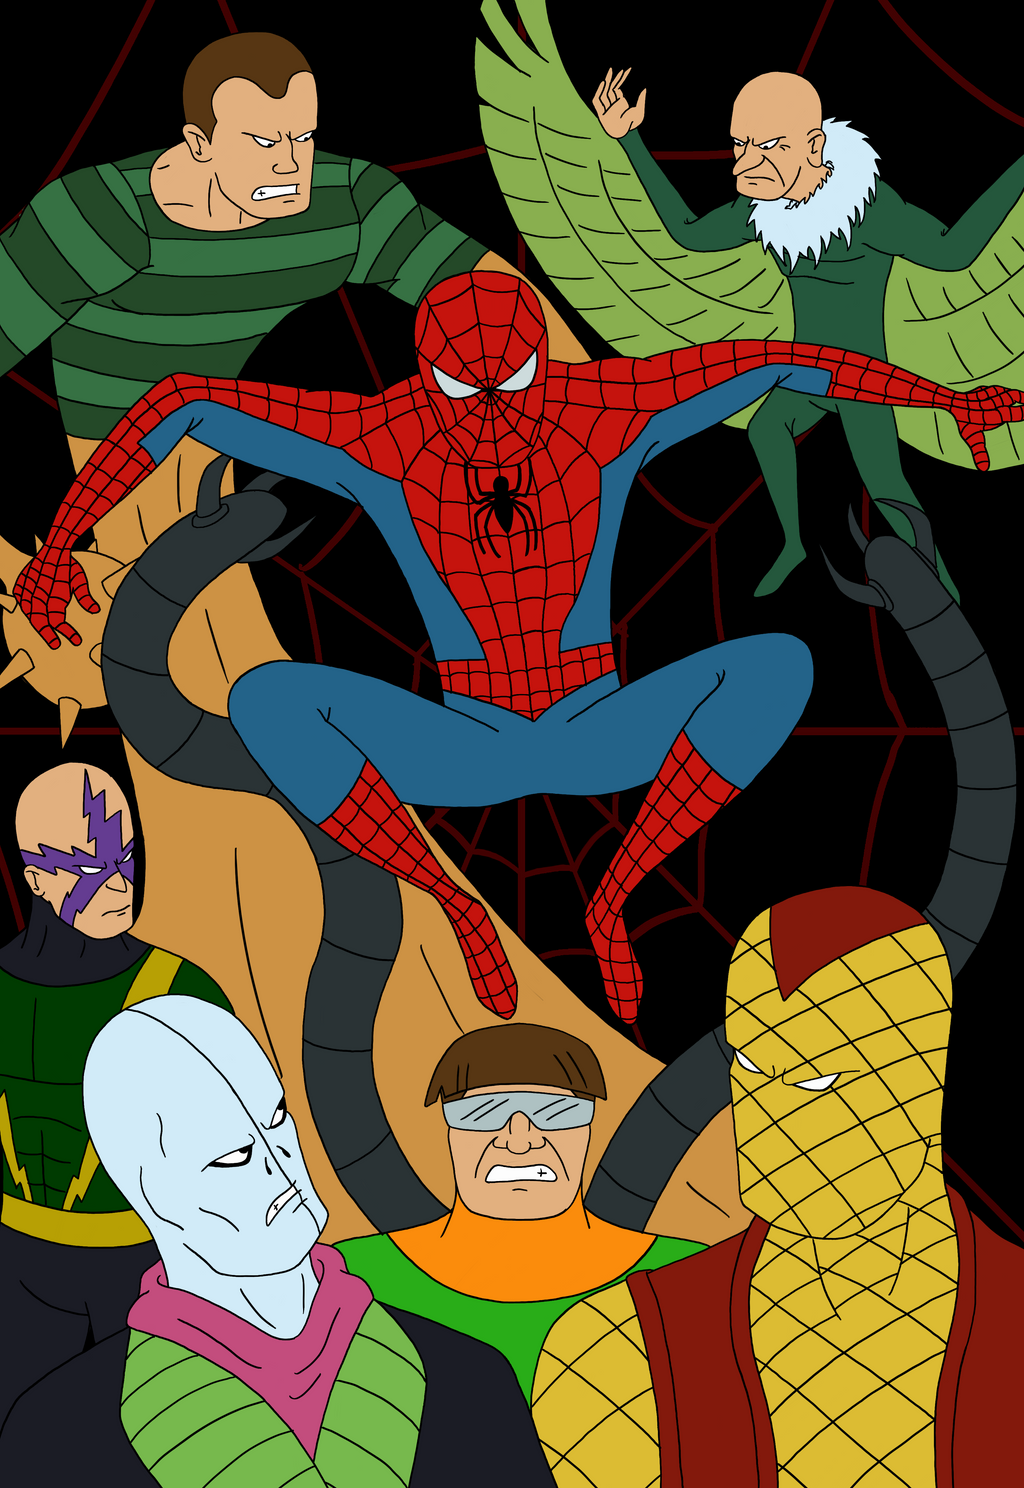 Spidey vs Sinister Six by MadMonkeyDane on DeviantArt